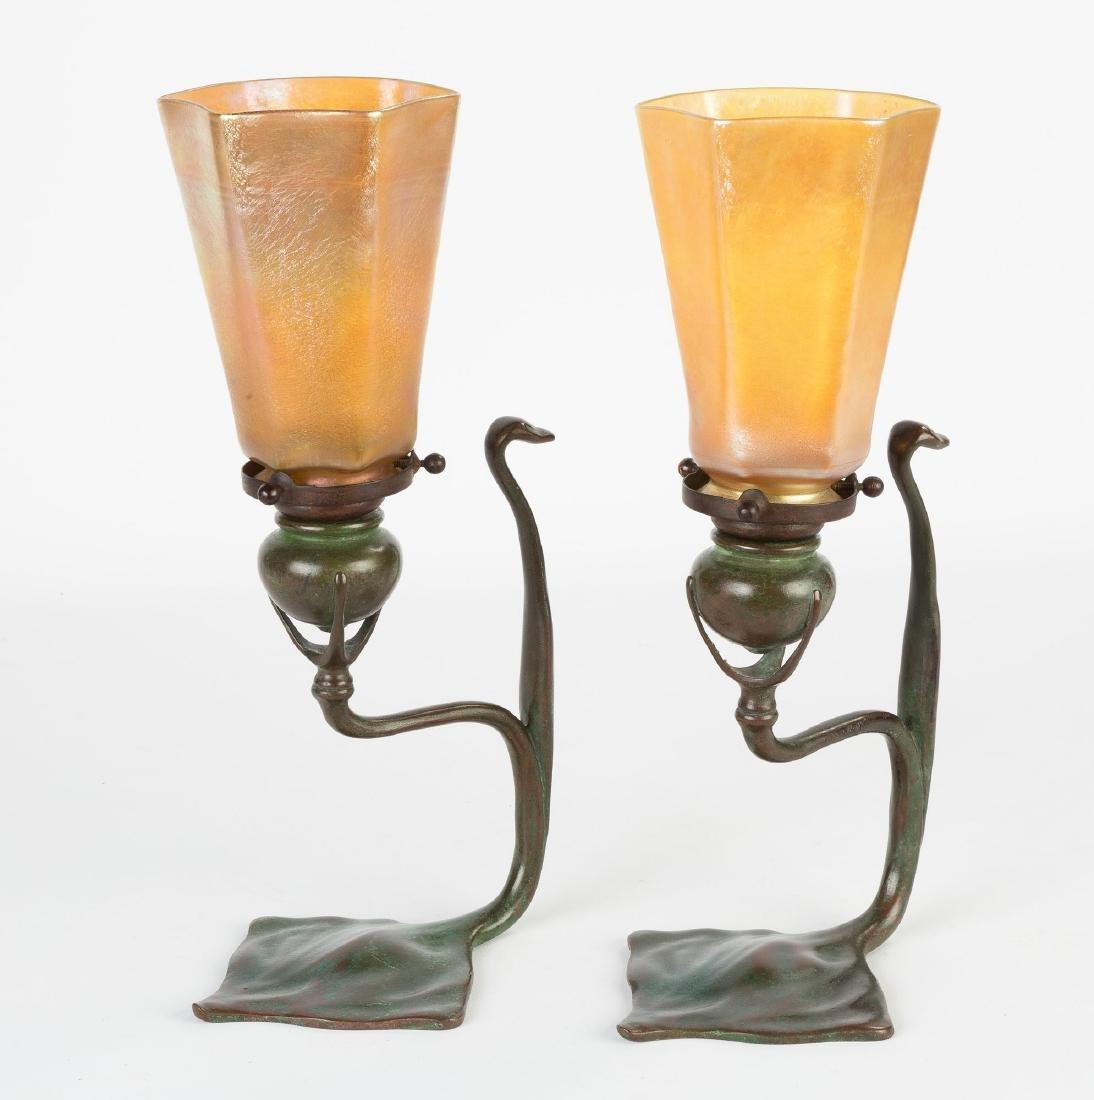 Pair of Tiffany Studios Cobra Candle Lamps